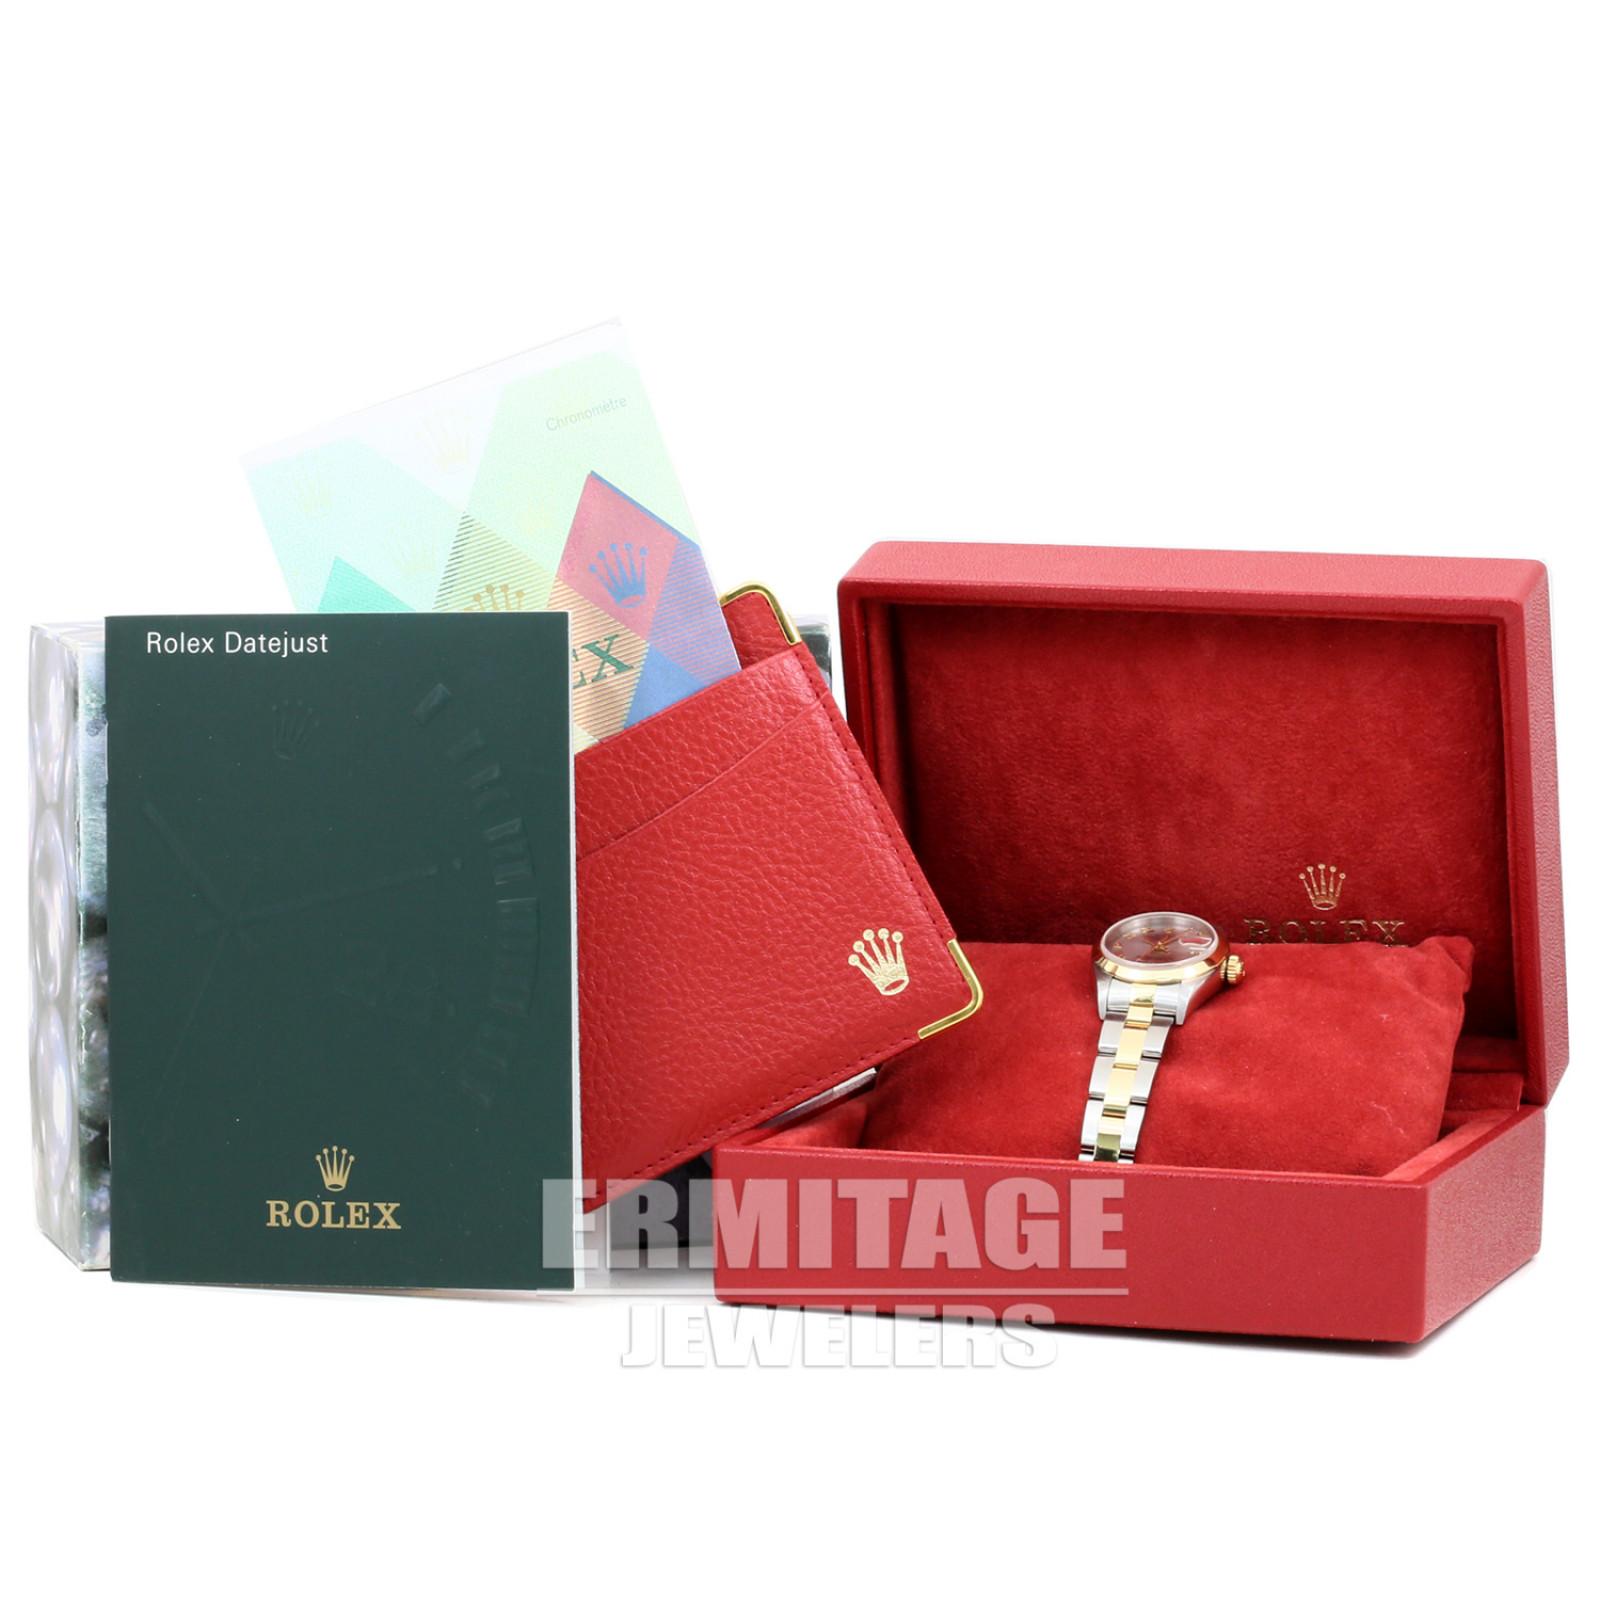 Rolex Datejust 79163 with Rhodium Dial